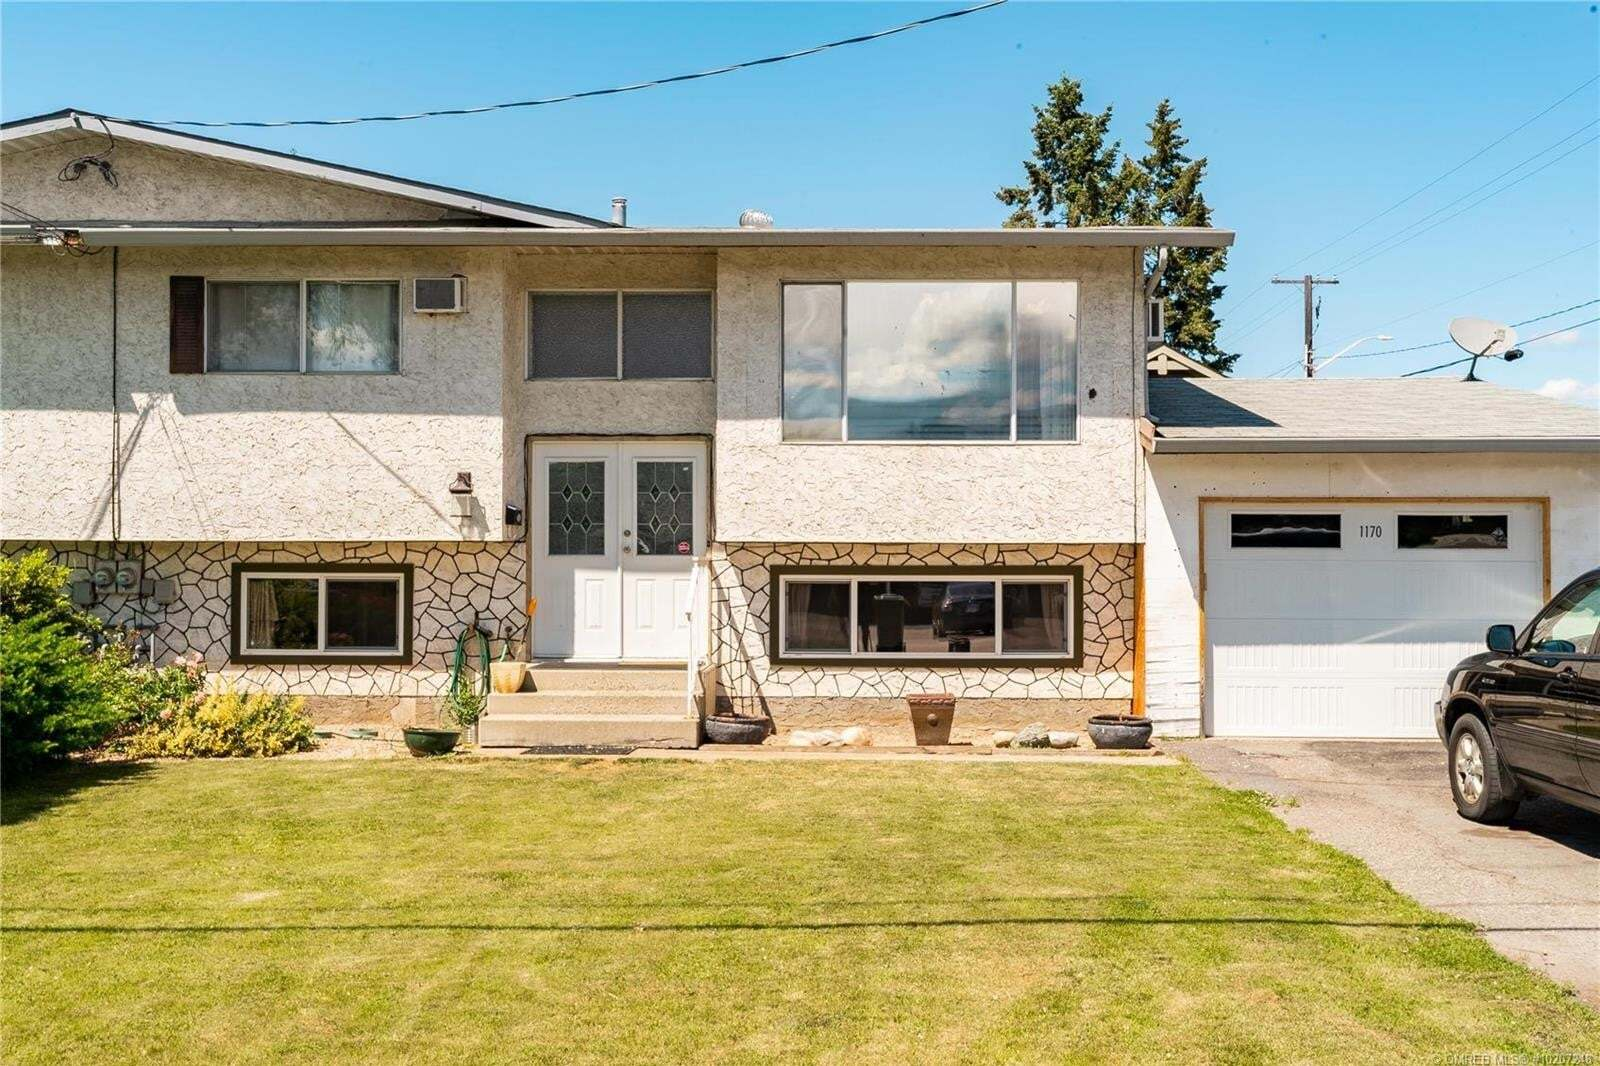 Townhouse for sale at 1170 Elwyn Rd Kelowna British Columbia - MLS: 10207248